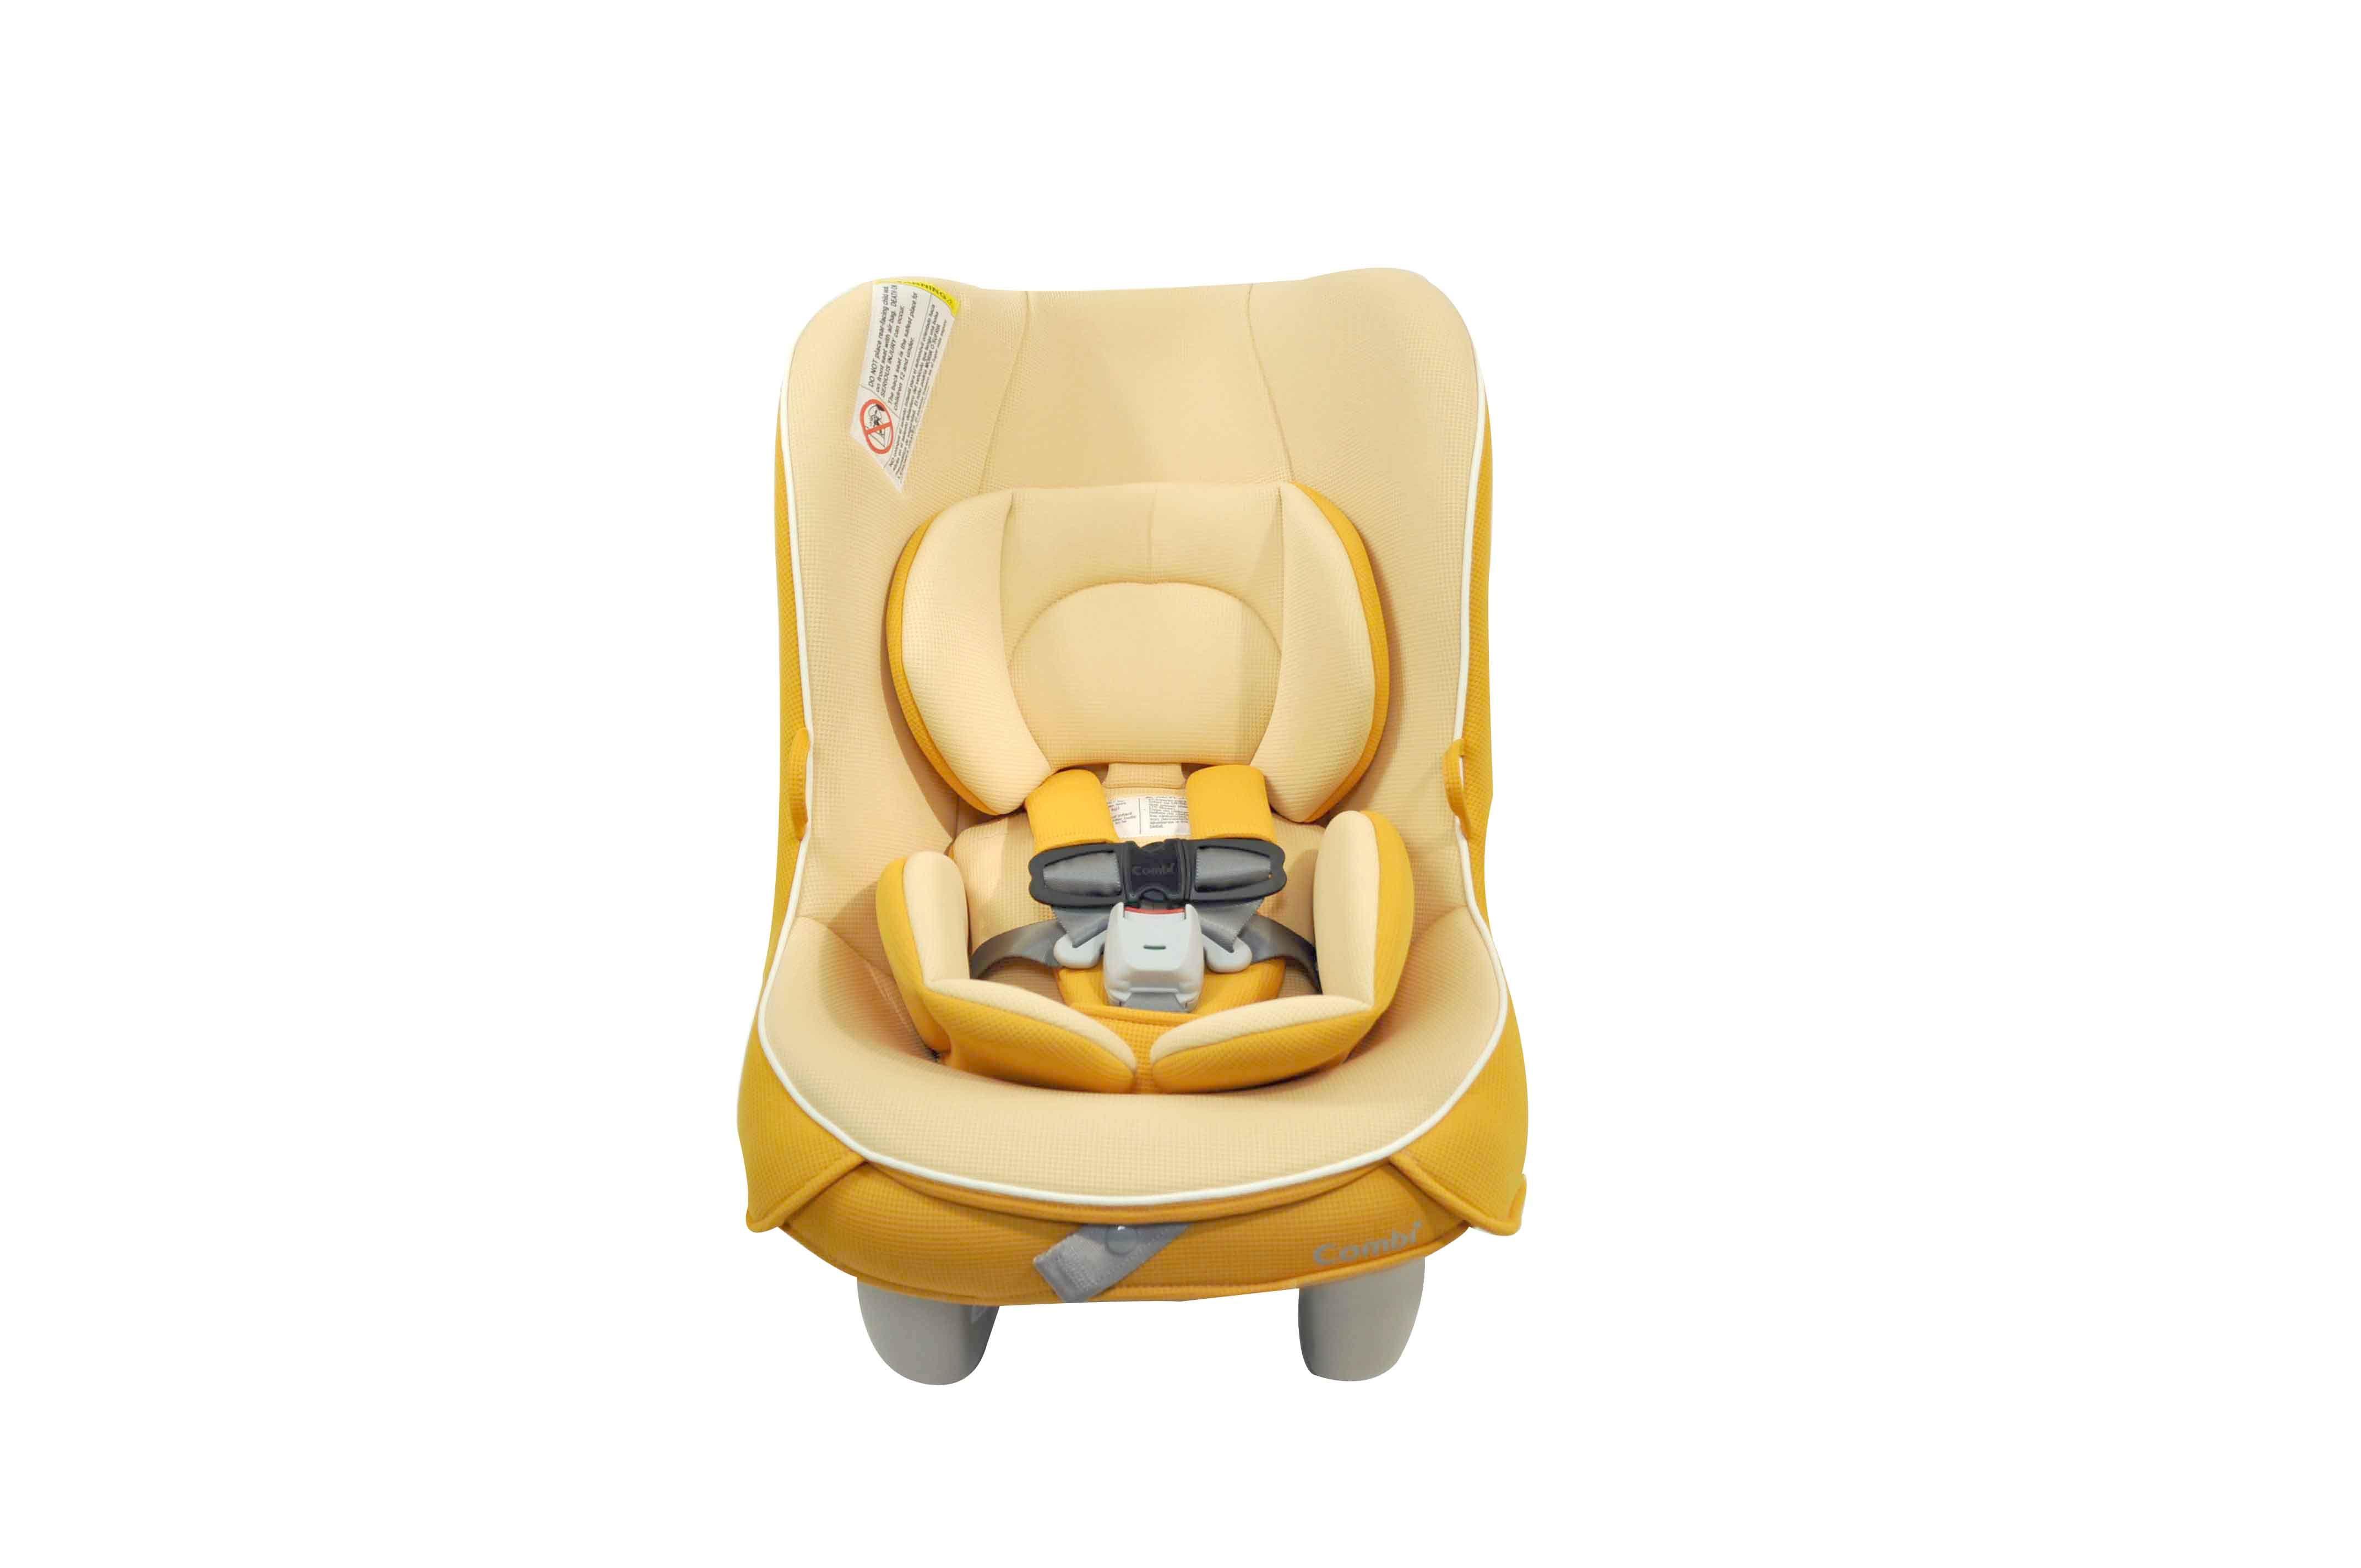 Car Seats The Combi Coccoro In Carrot Cake